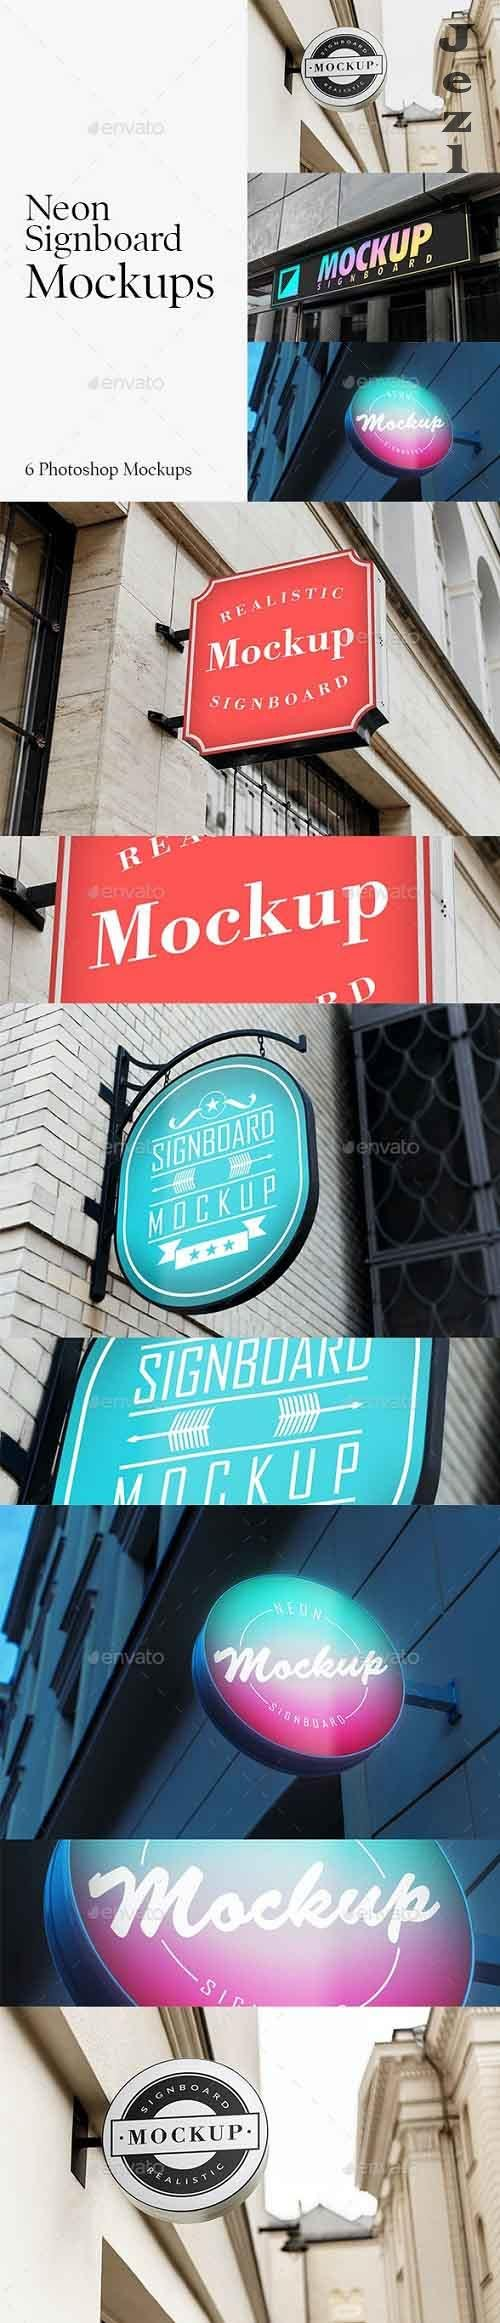 6 Neon Signboard Mockups 28700015